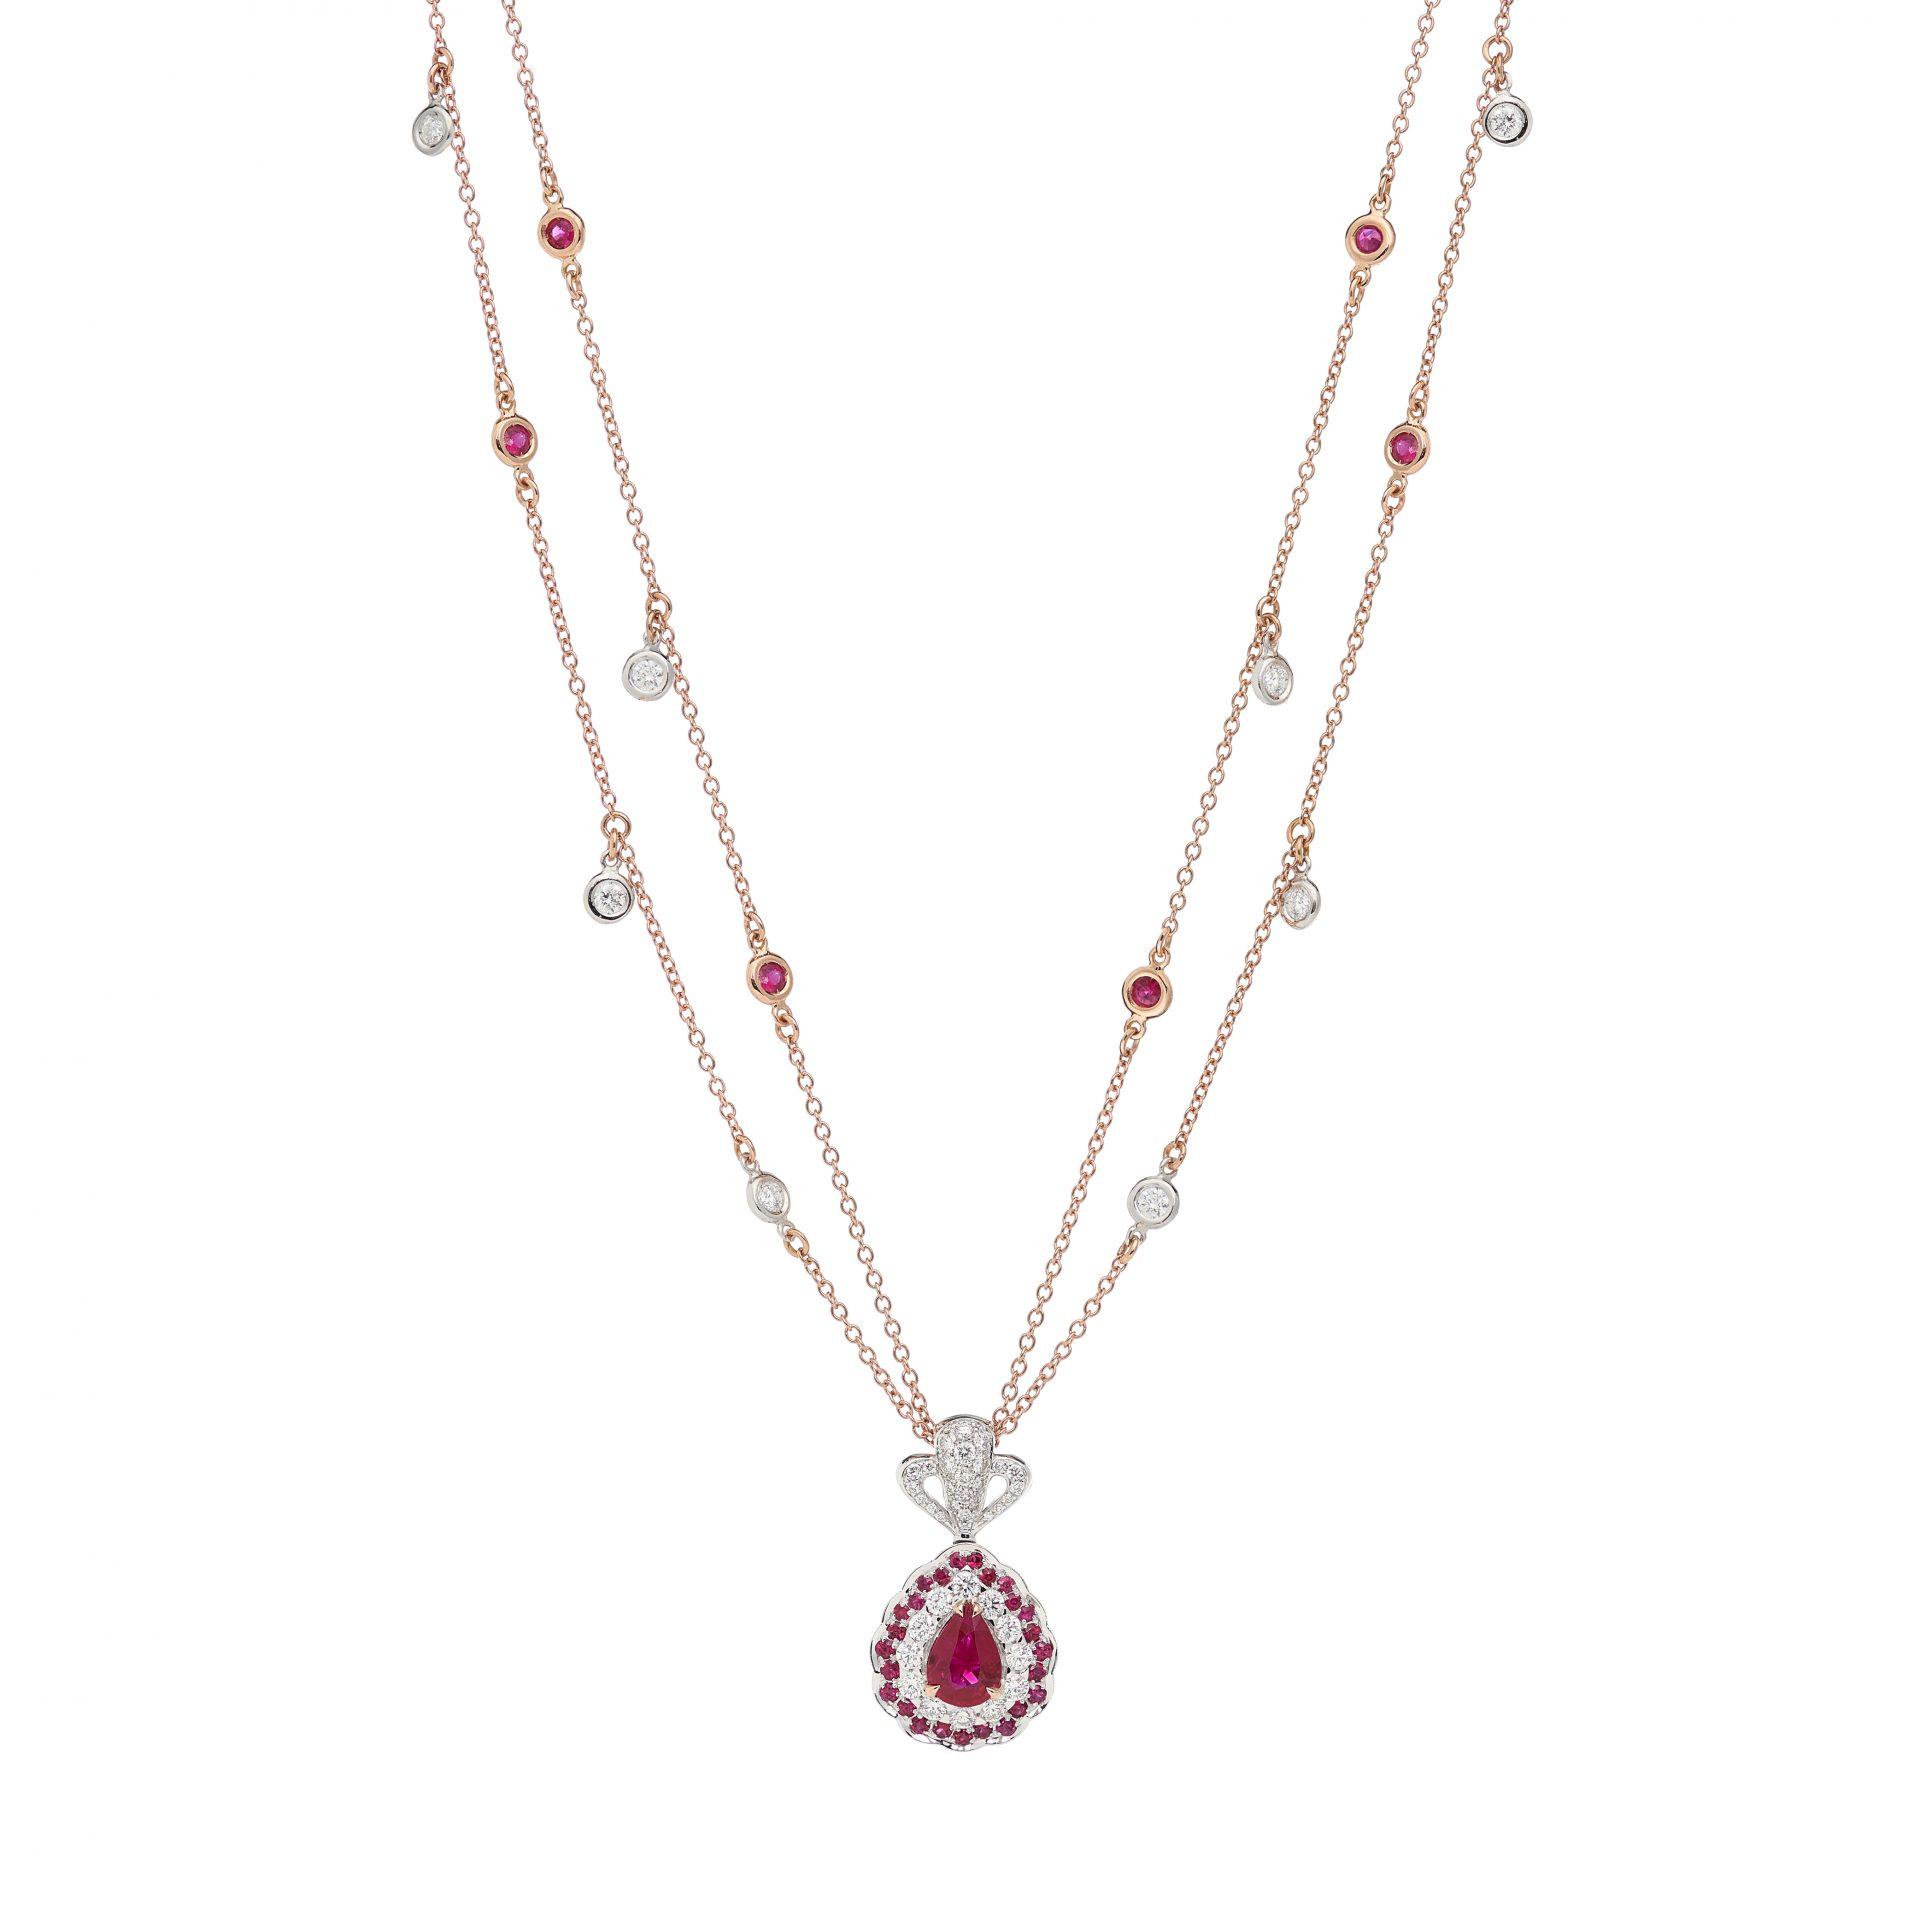 La Broderie Rouge Necklace